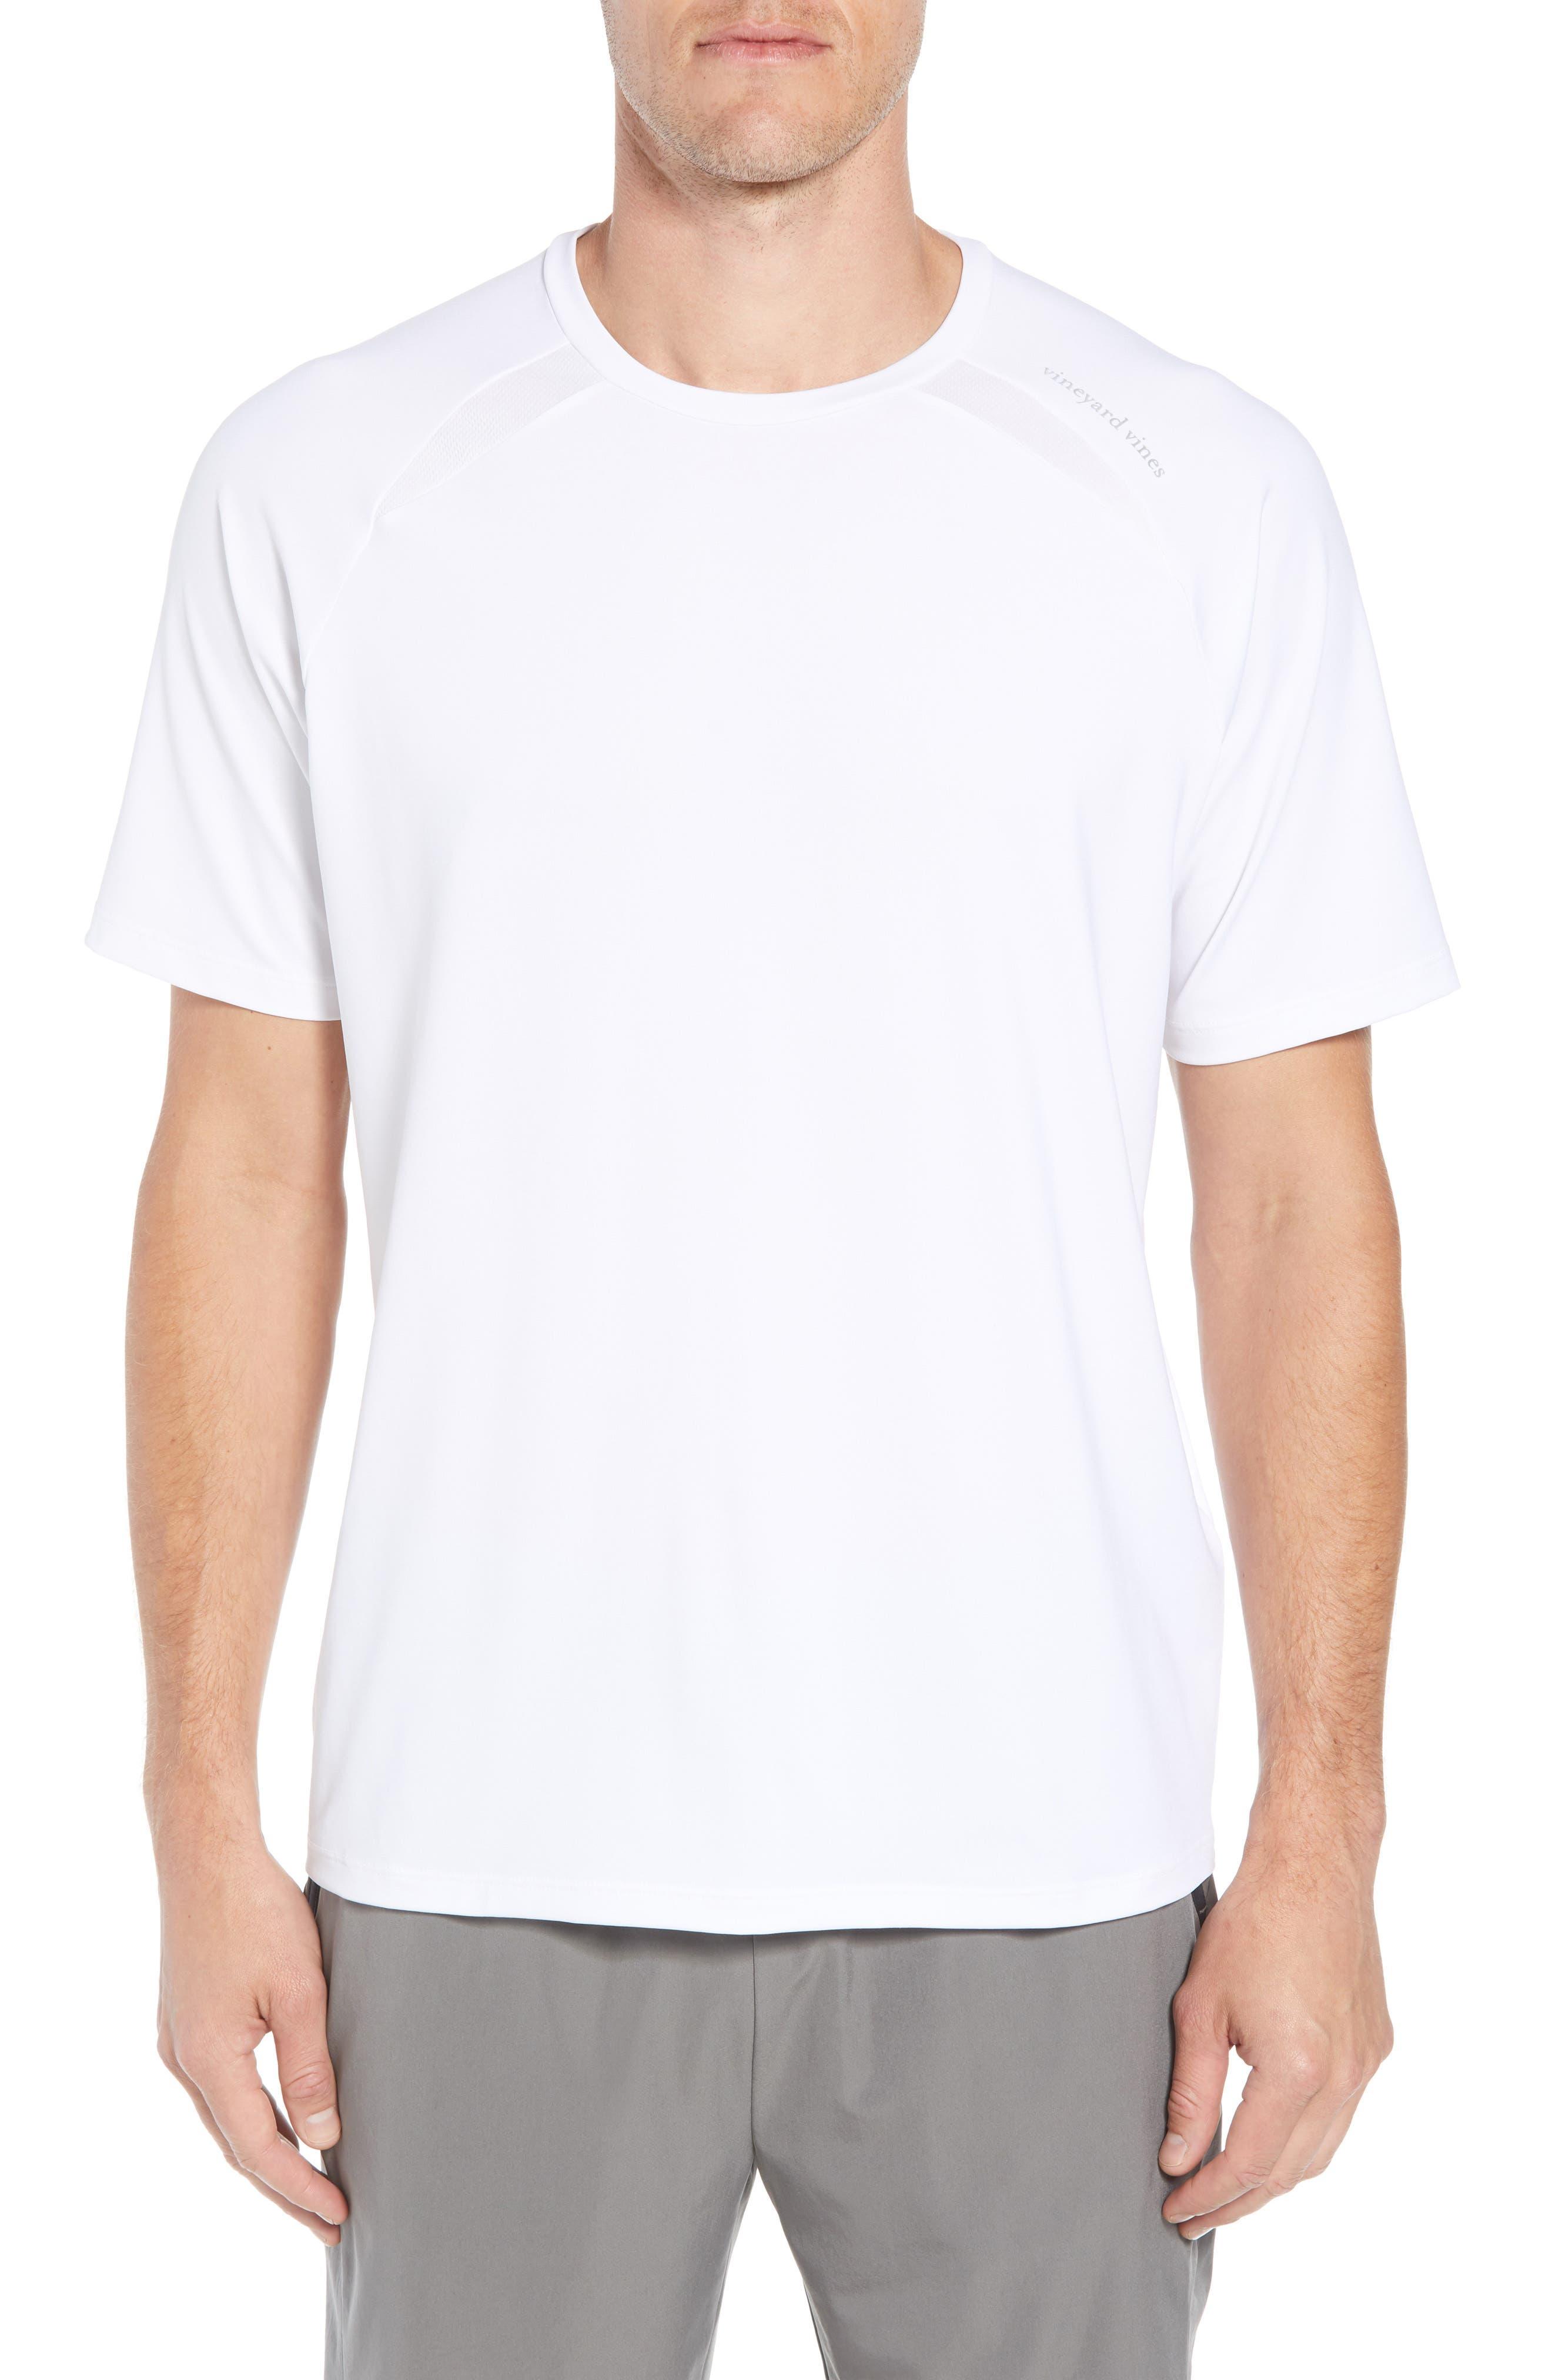 Vineyard Vines Mesh Inset T-Shirt, White